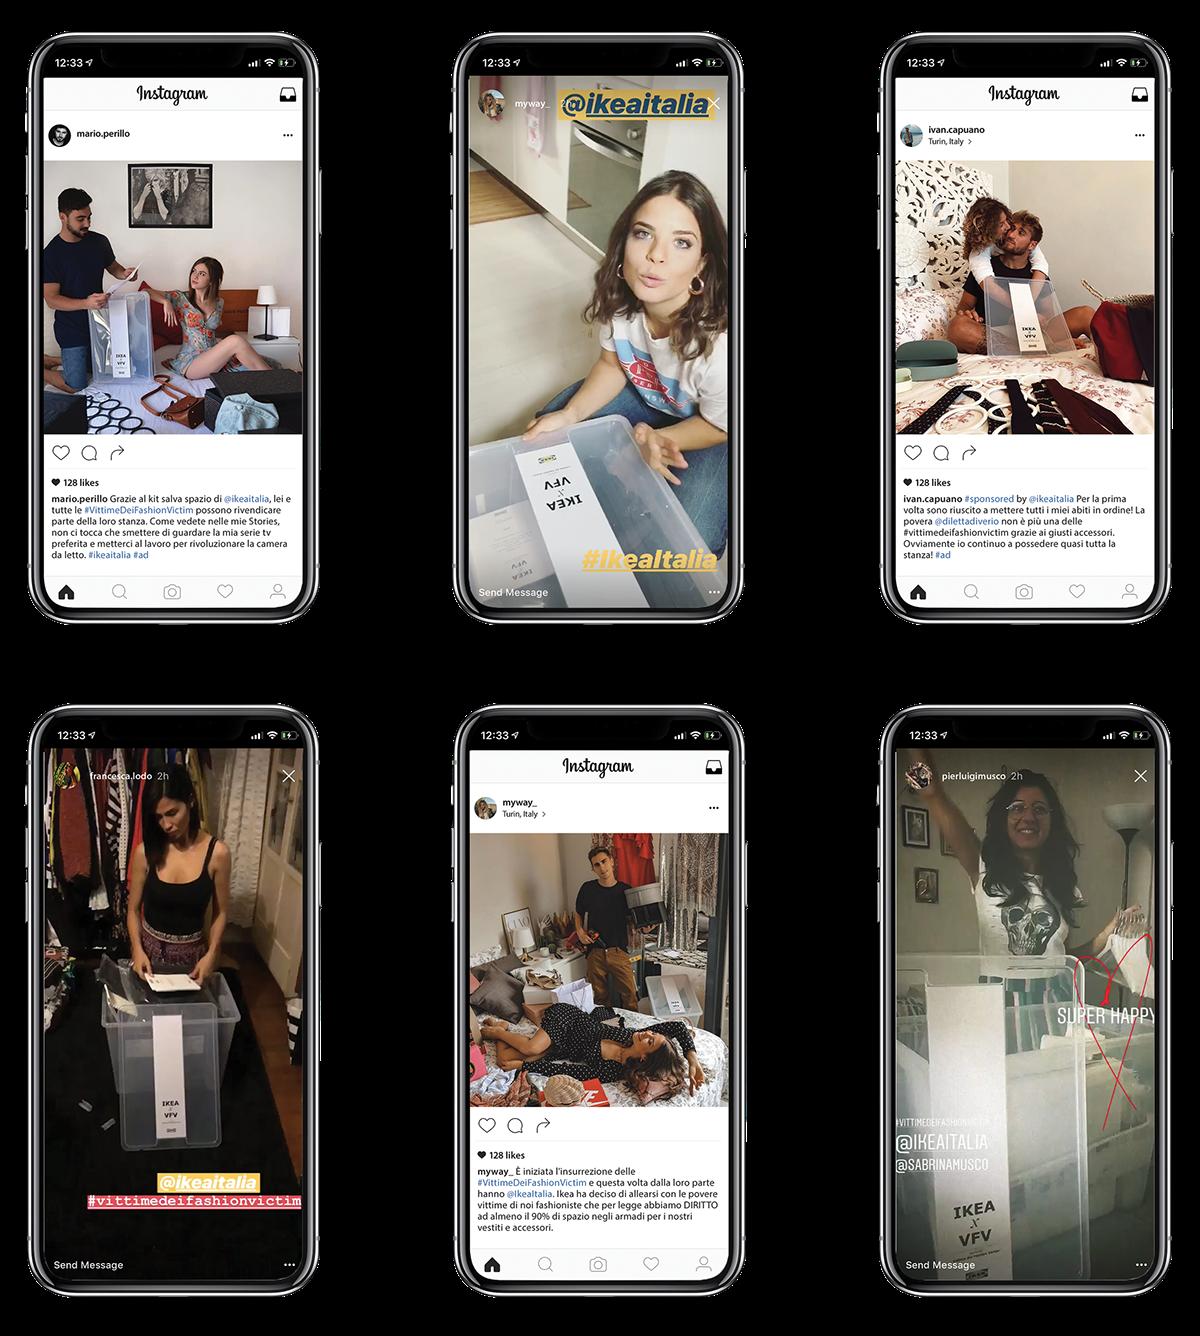 Mobile Tv Camera Da Letto Ikea.Ikea Victims Of Fashion Victims We Are Social On Behance